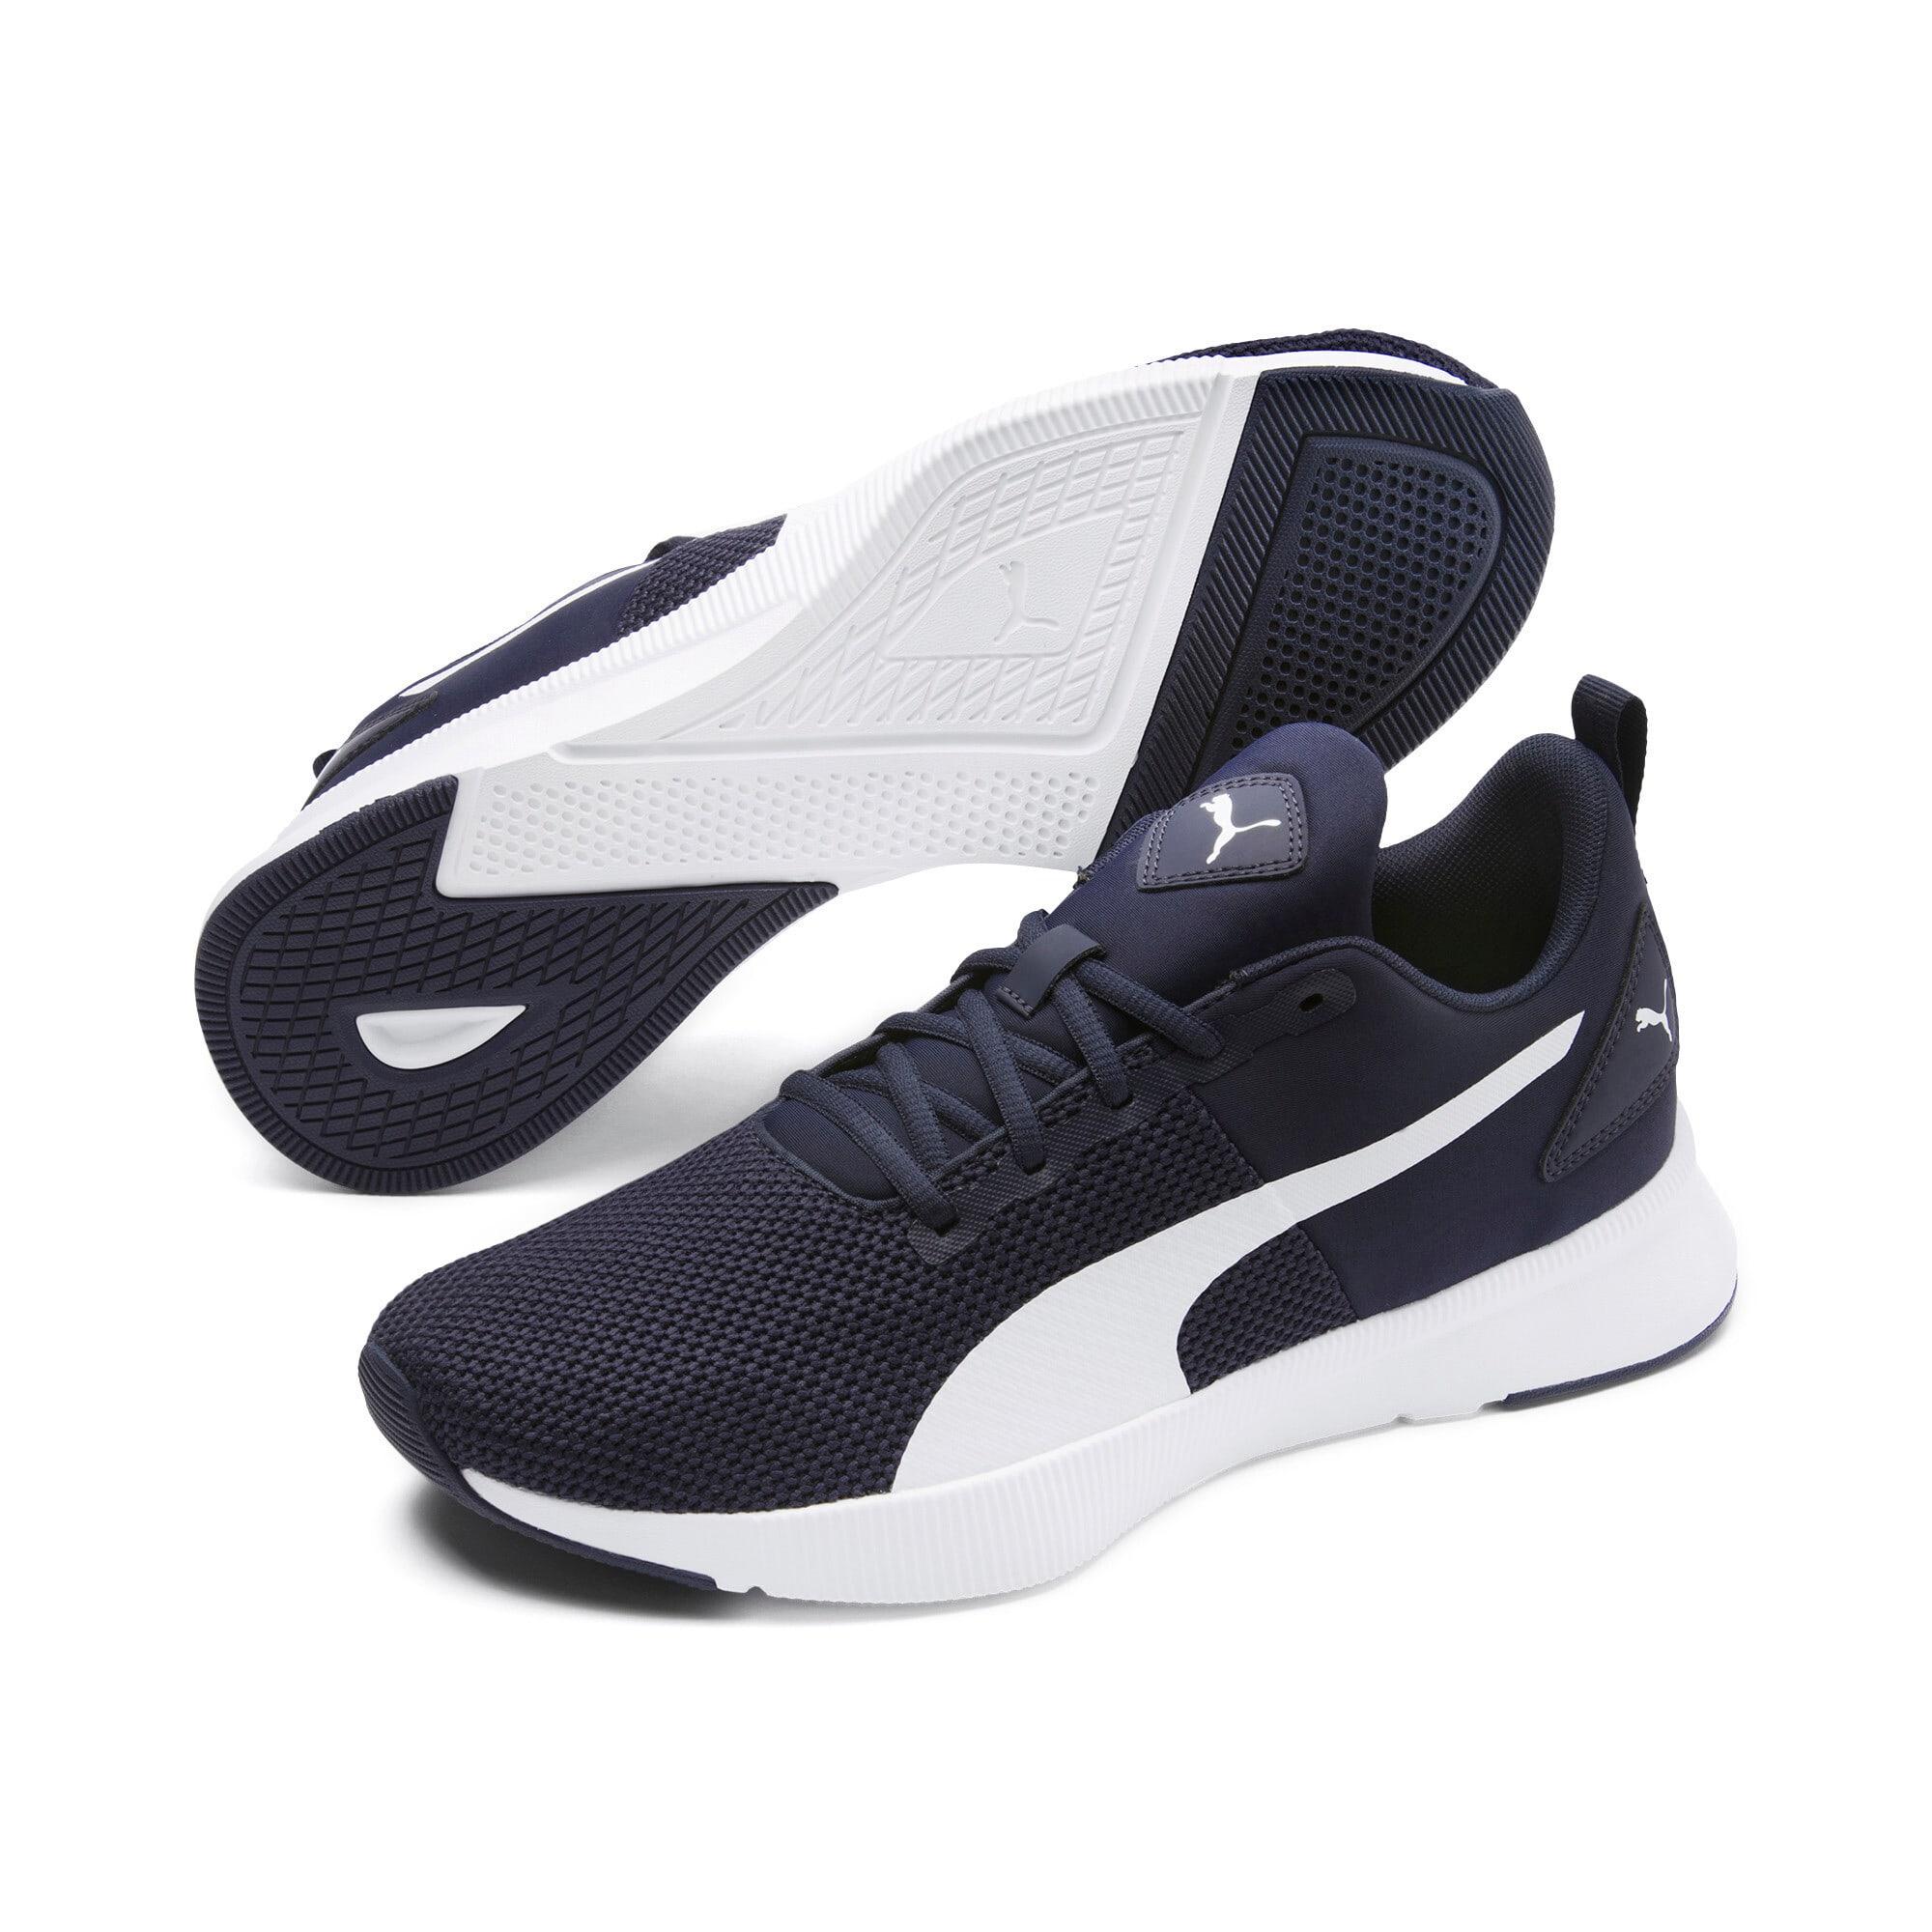 Thumbnail 2 of Flyer Runner Running Shoes, Peacoat-Puma White, medium